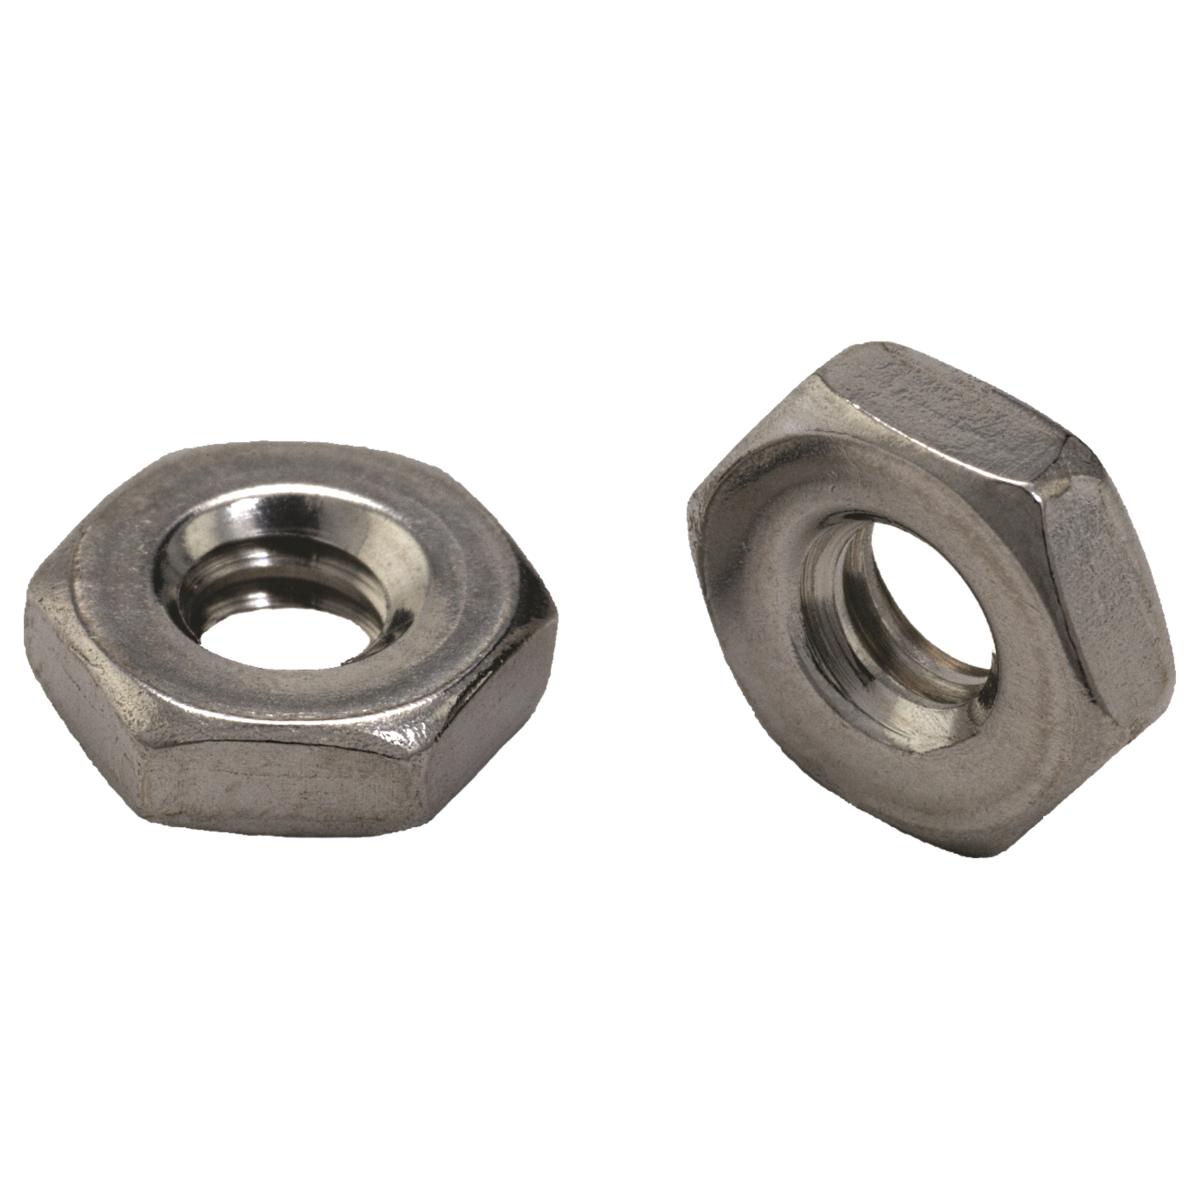 #12-24 Hex Machine Screw Nuts — 18-8 Stainless Steel, Coarse, 100/PKG